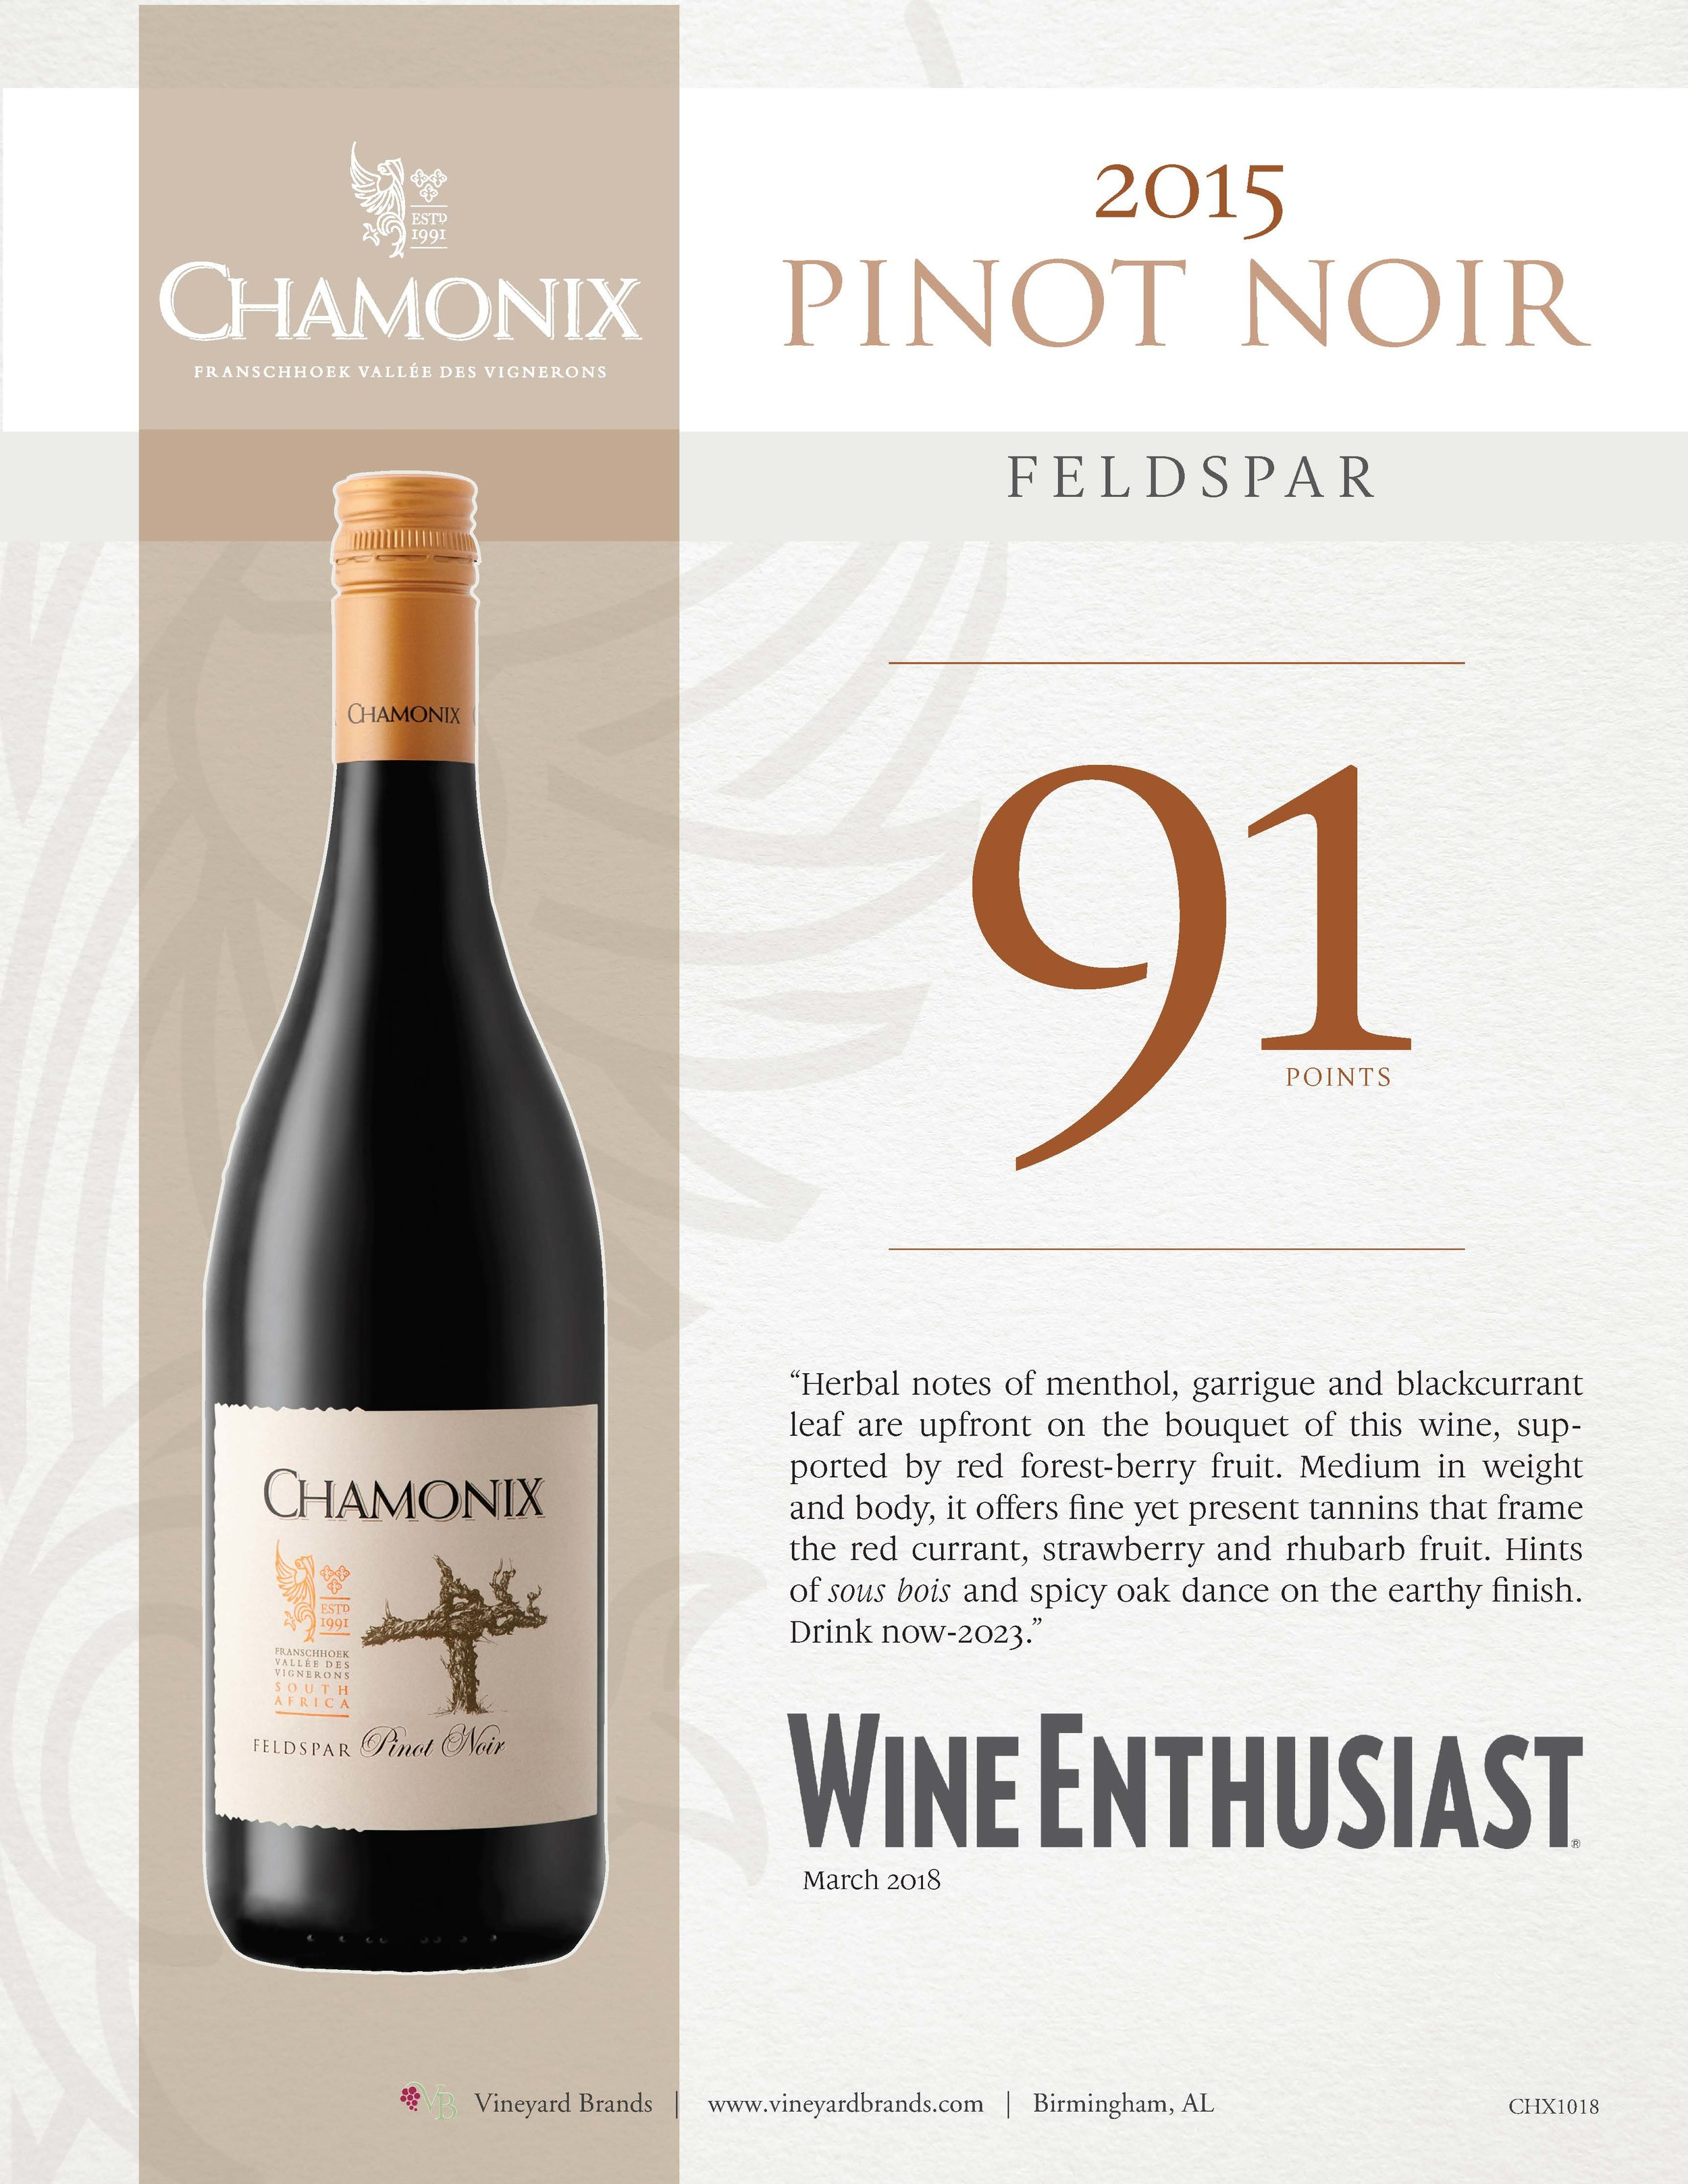 Chamonix Pinot Noir 2015 Feldspar.jpg